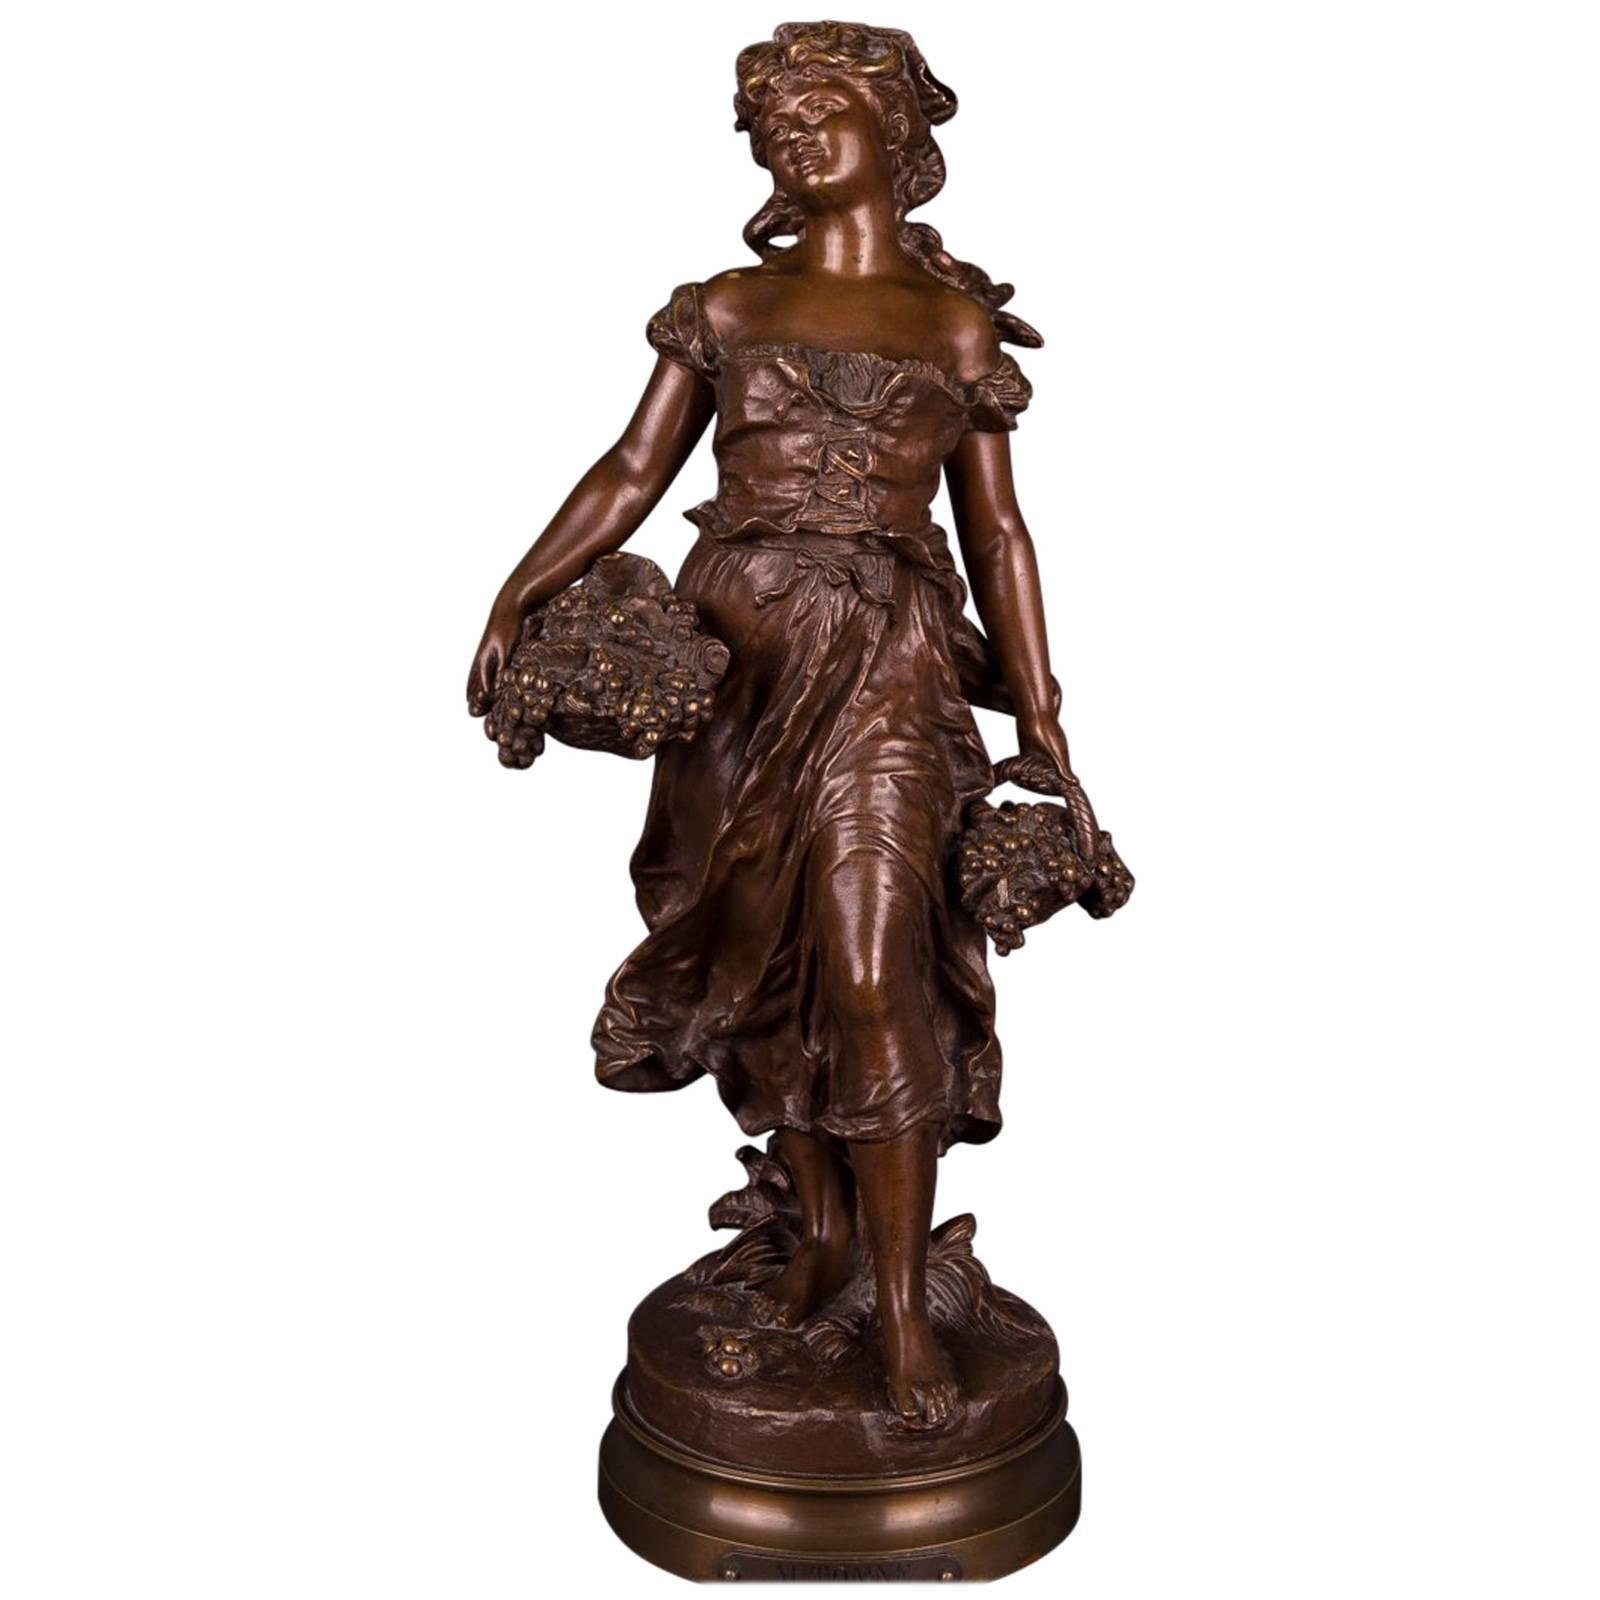 19th Century Bronze Sculpture by Mathurin Moreau, Automne, Autumn